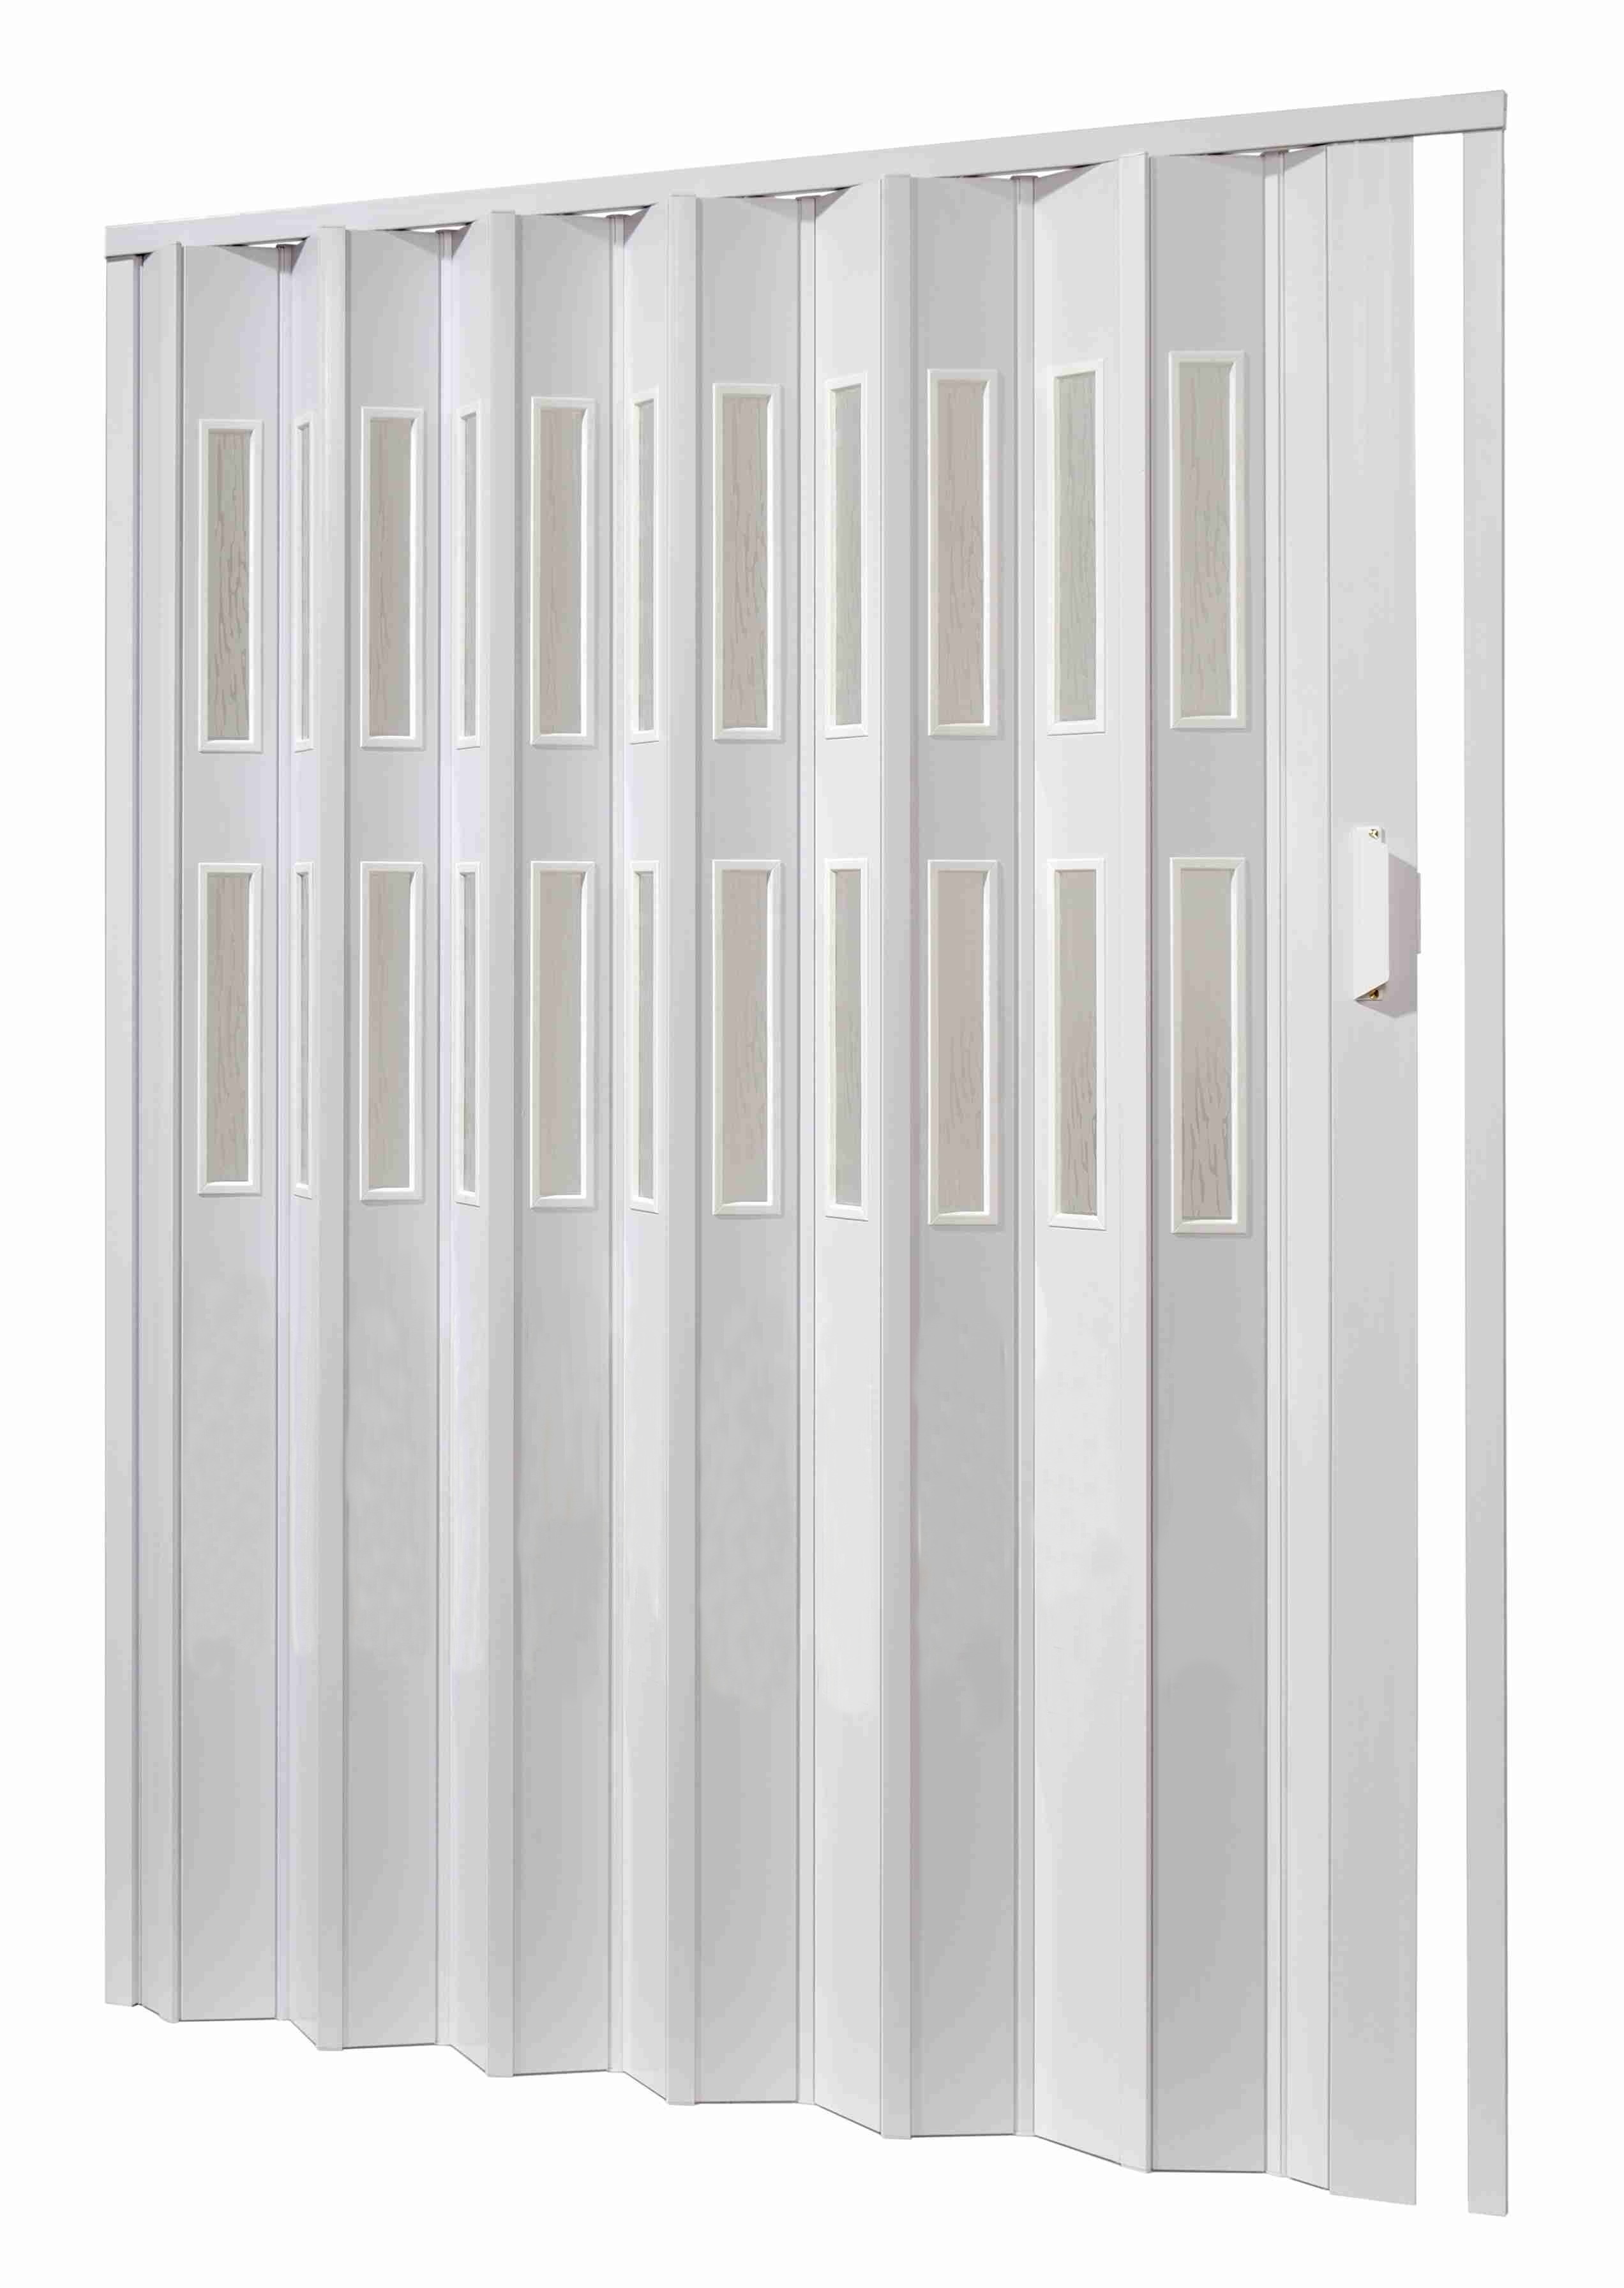 Shrnovací dveře 132x200cm bílé ODSTÍN: BÍLÁ, TYP DVEŘÍ: plné